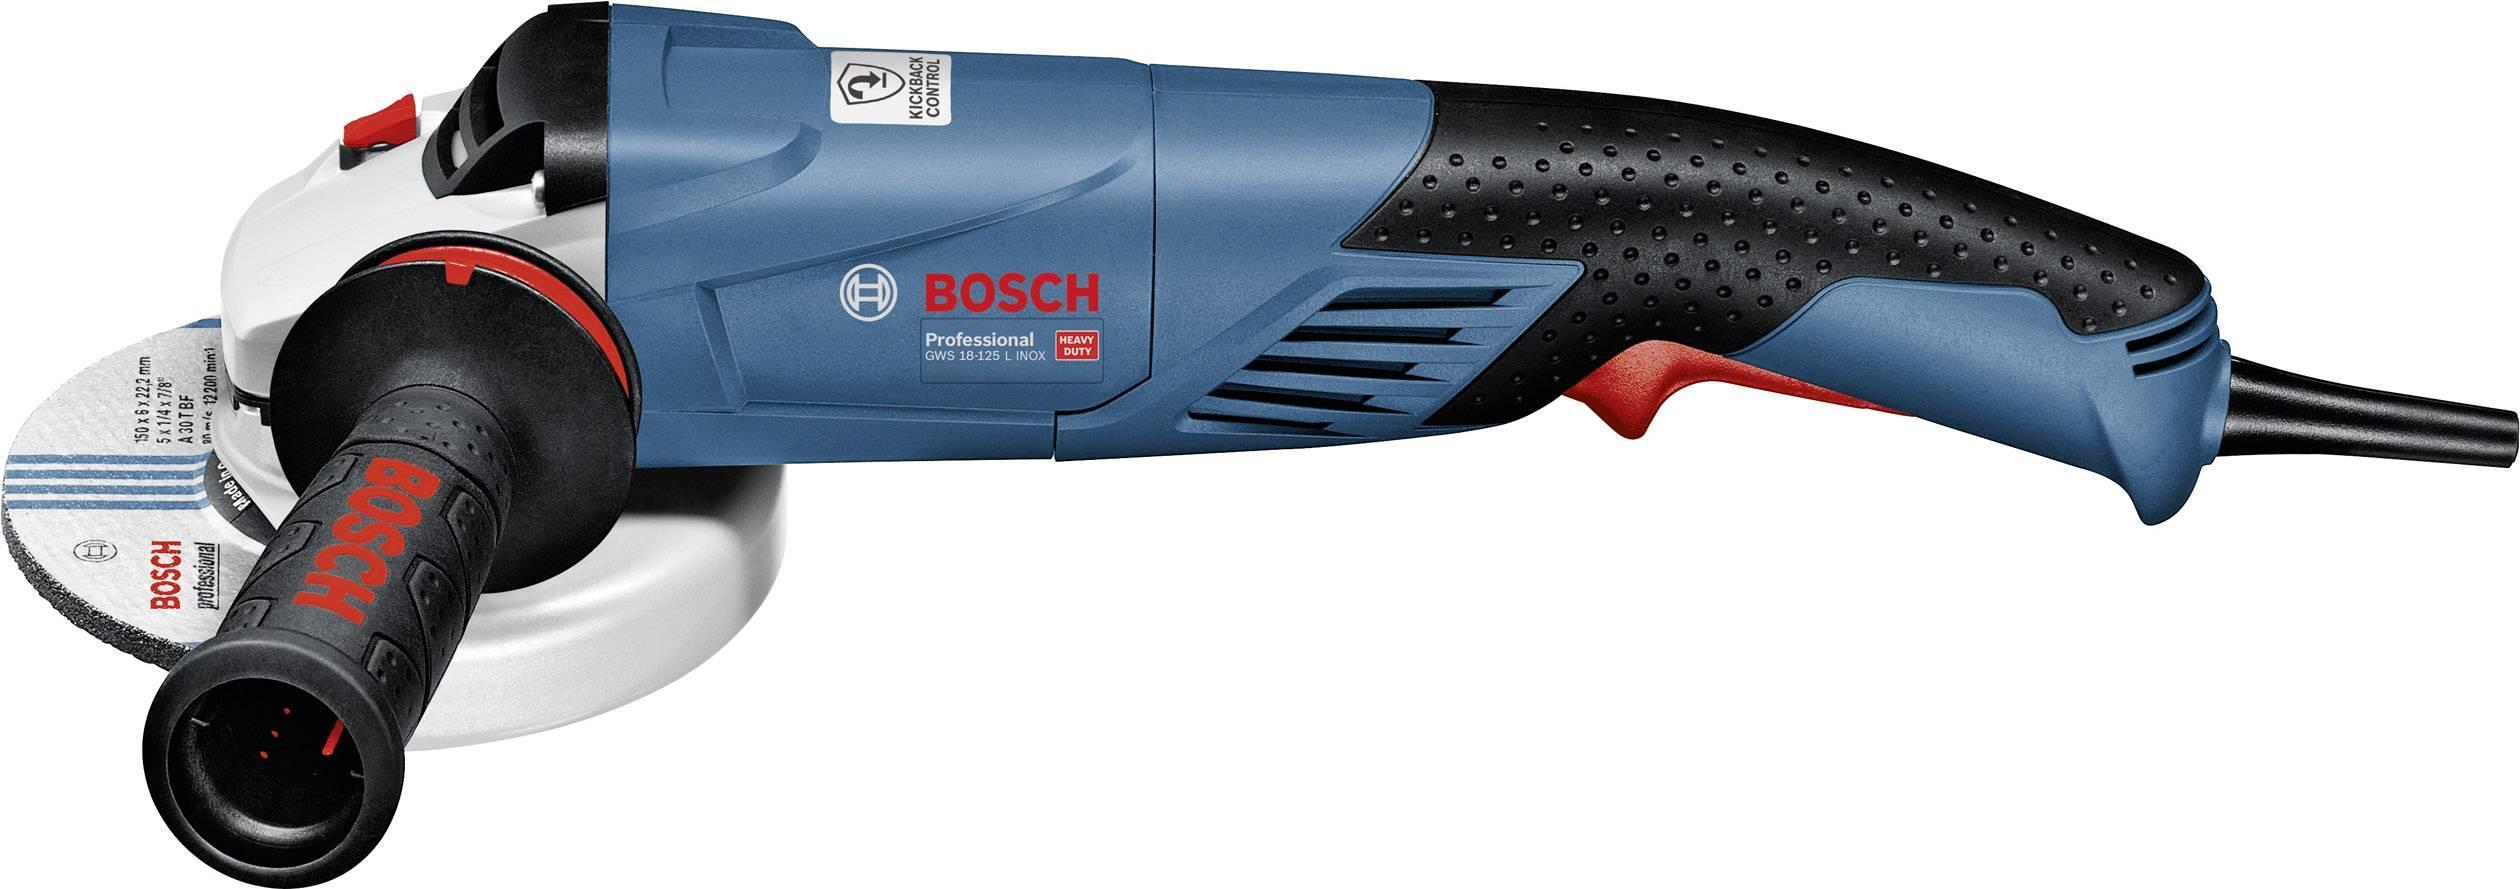 Máy mài góc 1800W Bosch GWS 18-125 L